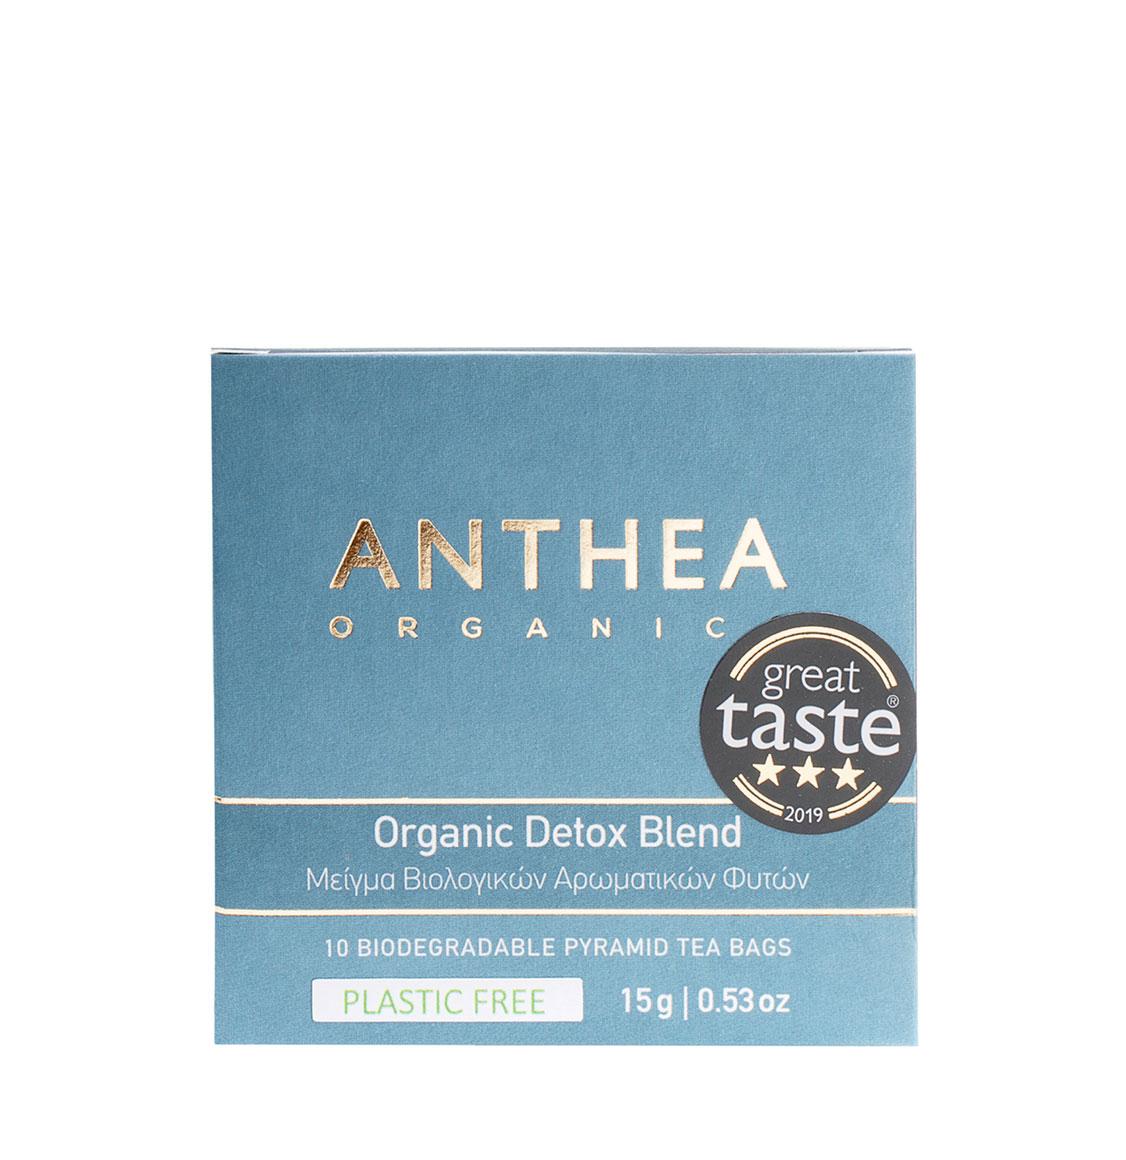 Anthea Organics Βιολογικό Μείγμα Βοτάνων Detox Blend 10 Plastic Free Pyramid Tea Bags